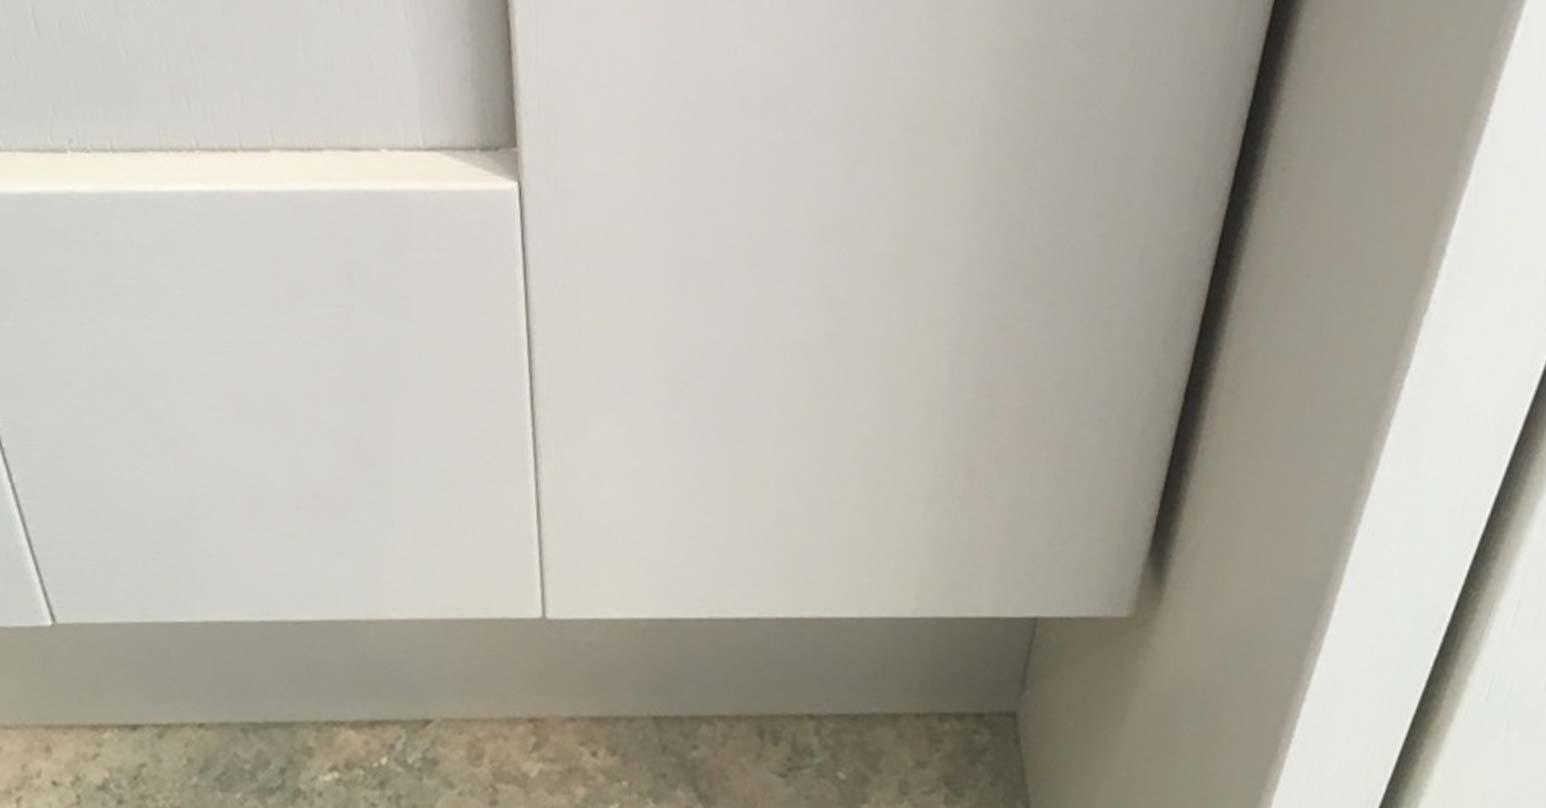 Damaged cupboard door - After repair